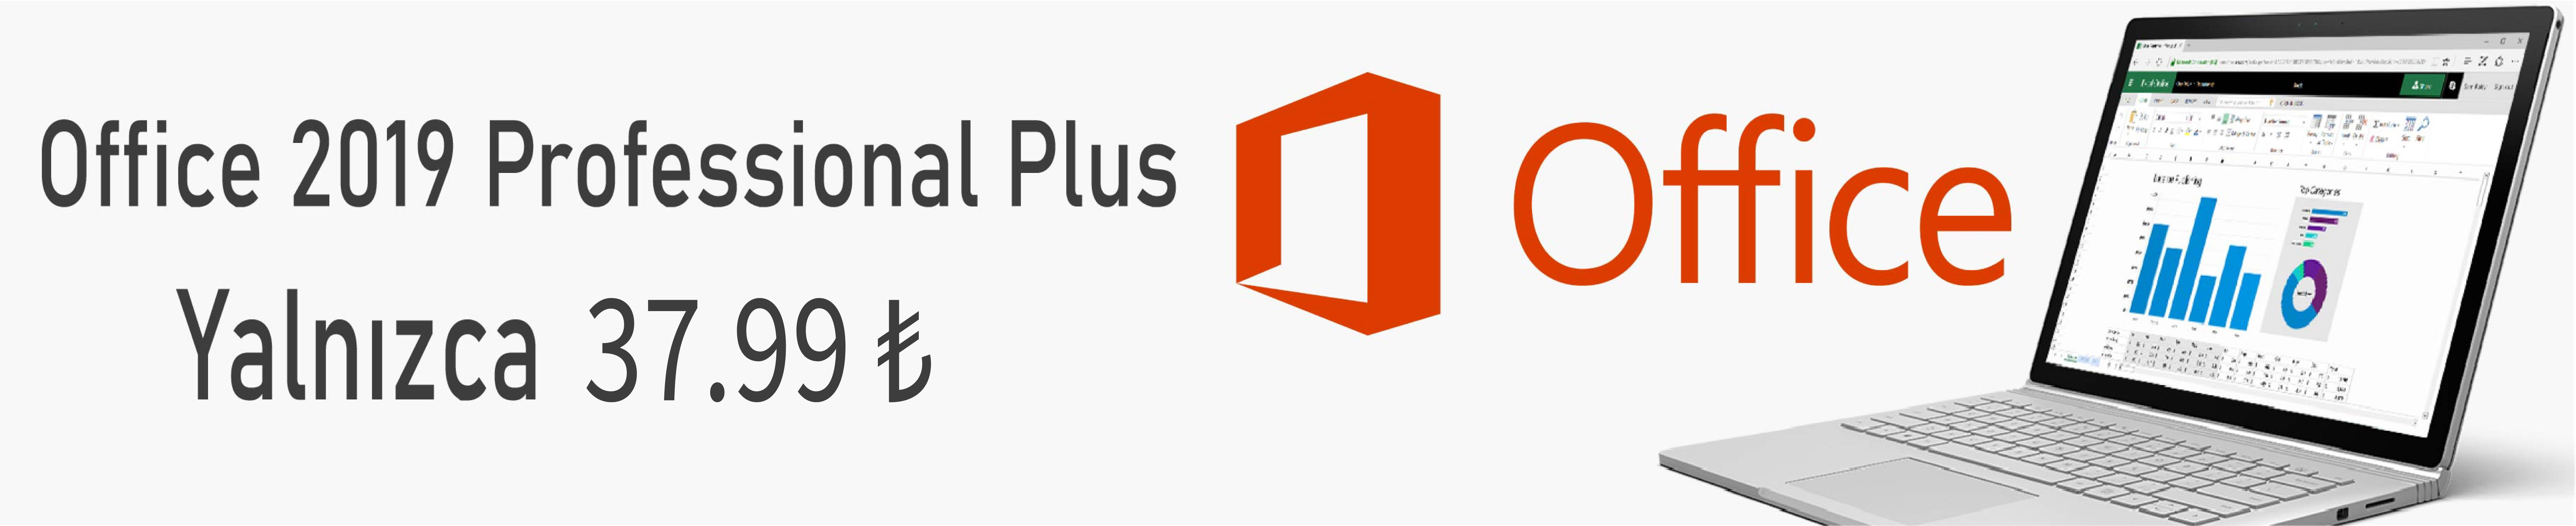 Office 2019 Pro Plus Lisans Anahtarı Yalnızca 37.99 TL